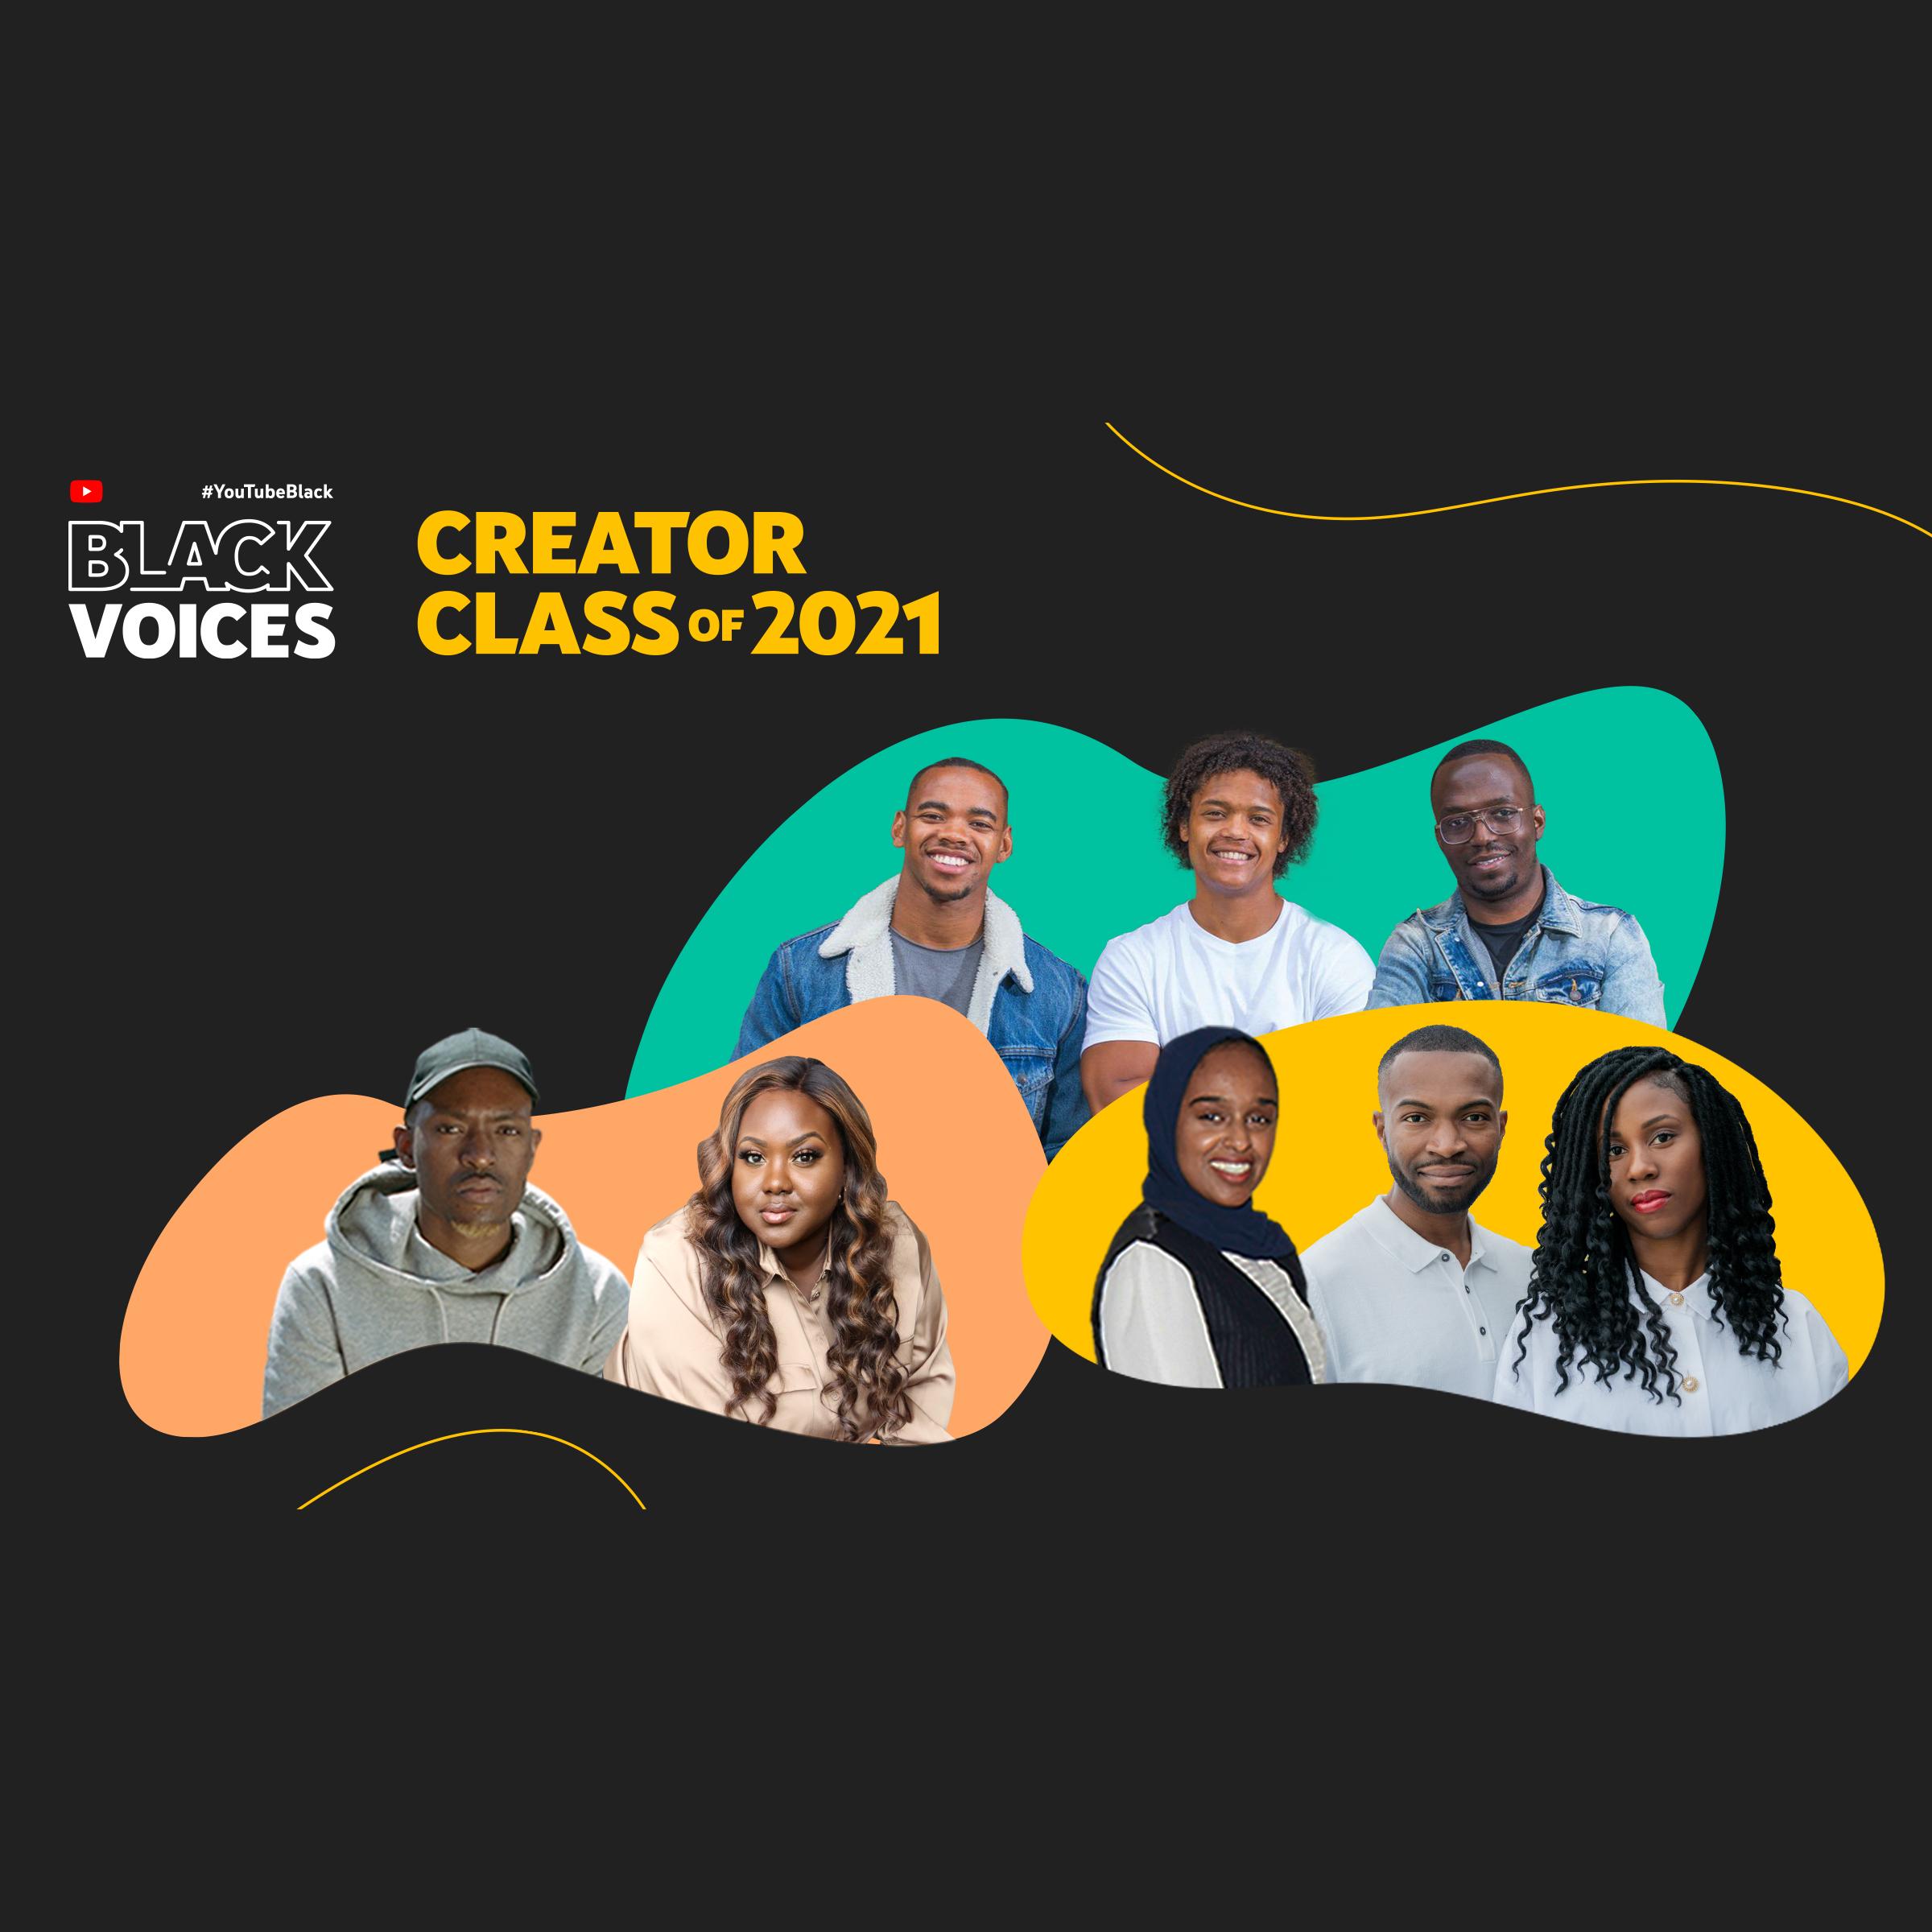 Meet the UK's #YouTubeBlackVoices Creator Class of 2021